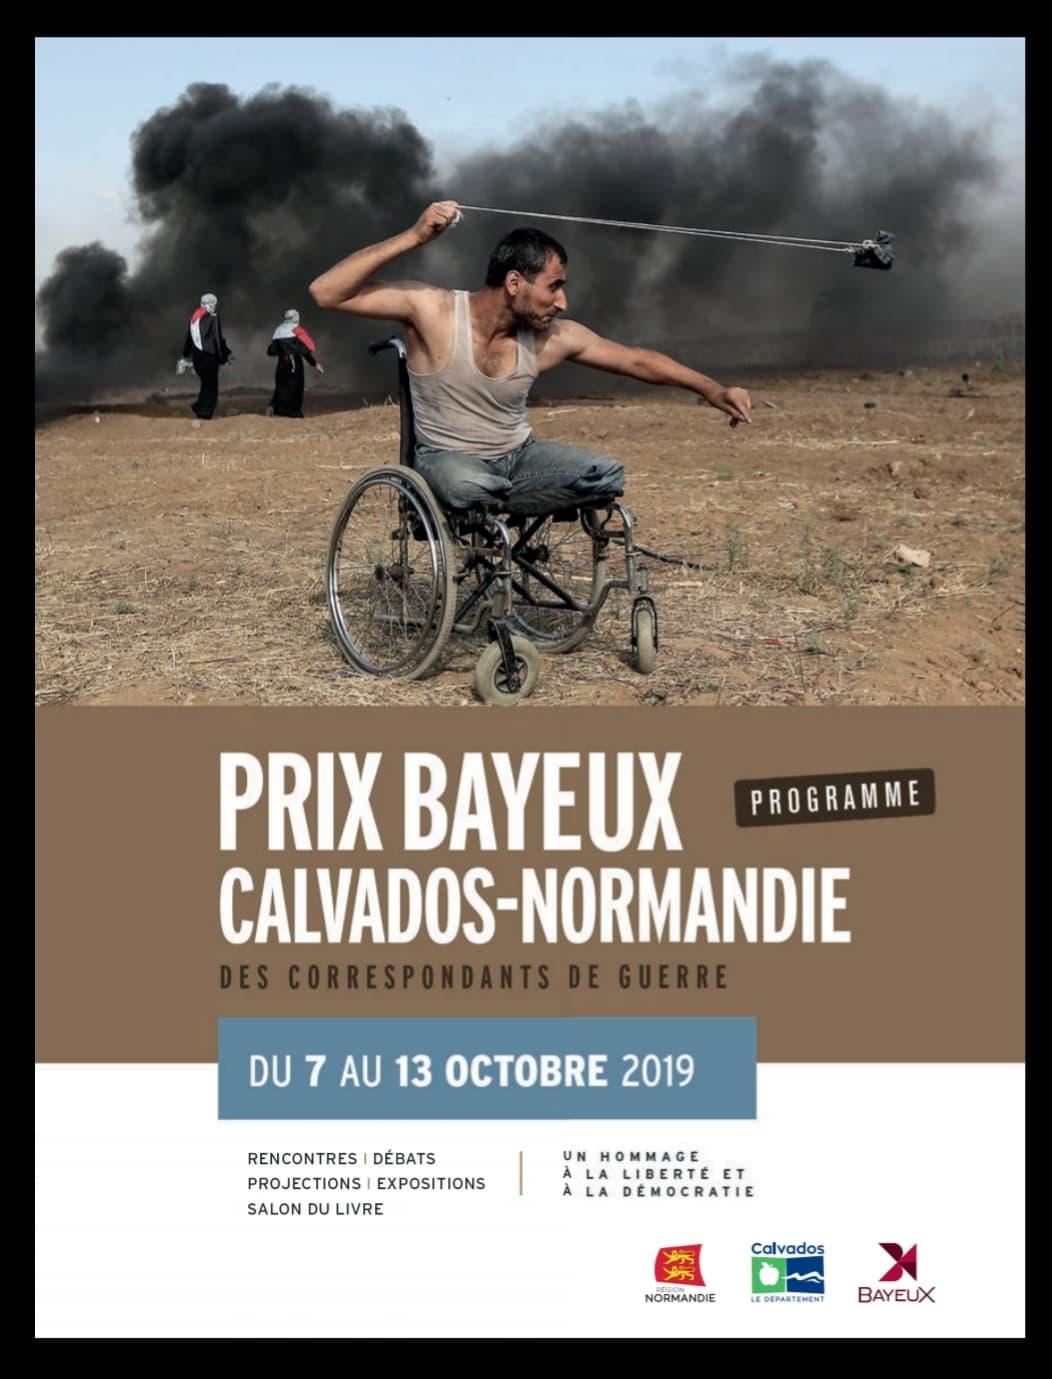 Prix Bayeux Calvados-Normandie des correspondants de guerre